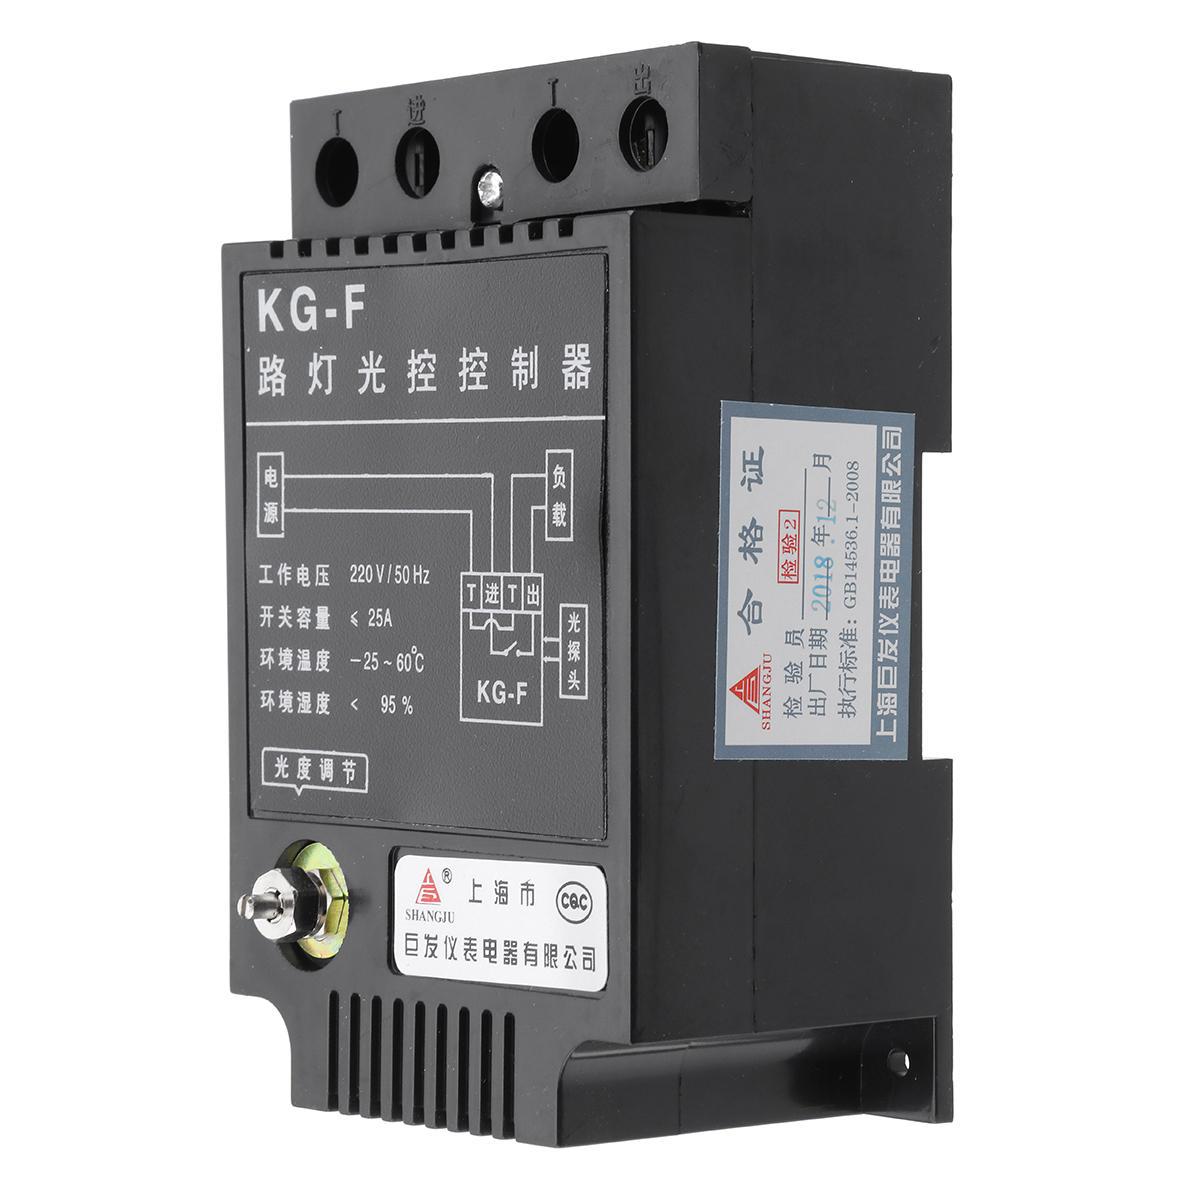 KG-F 220V Light Control Switch Automatic Corridor Light Sensor Adjustable Intelligent Street Lamp Controller